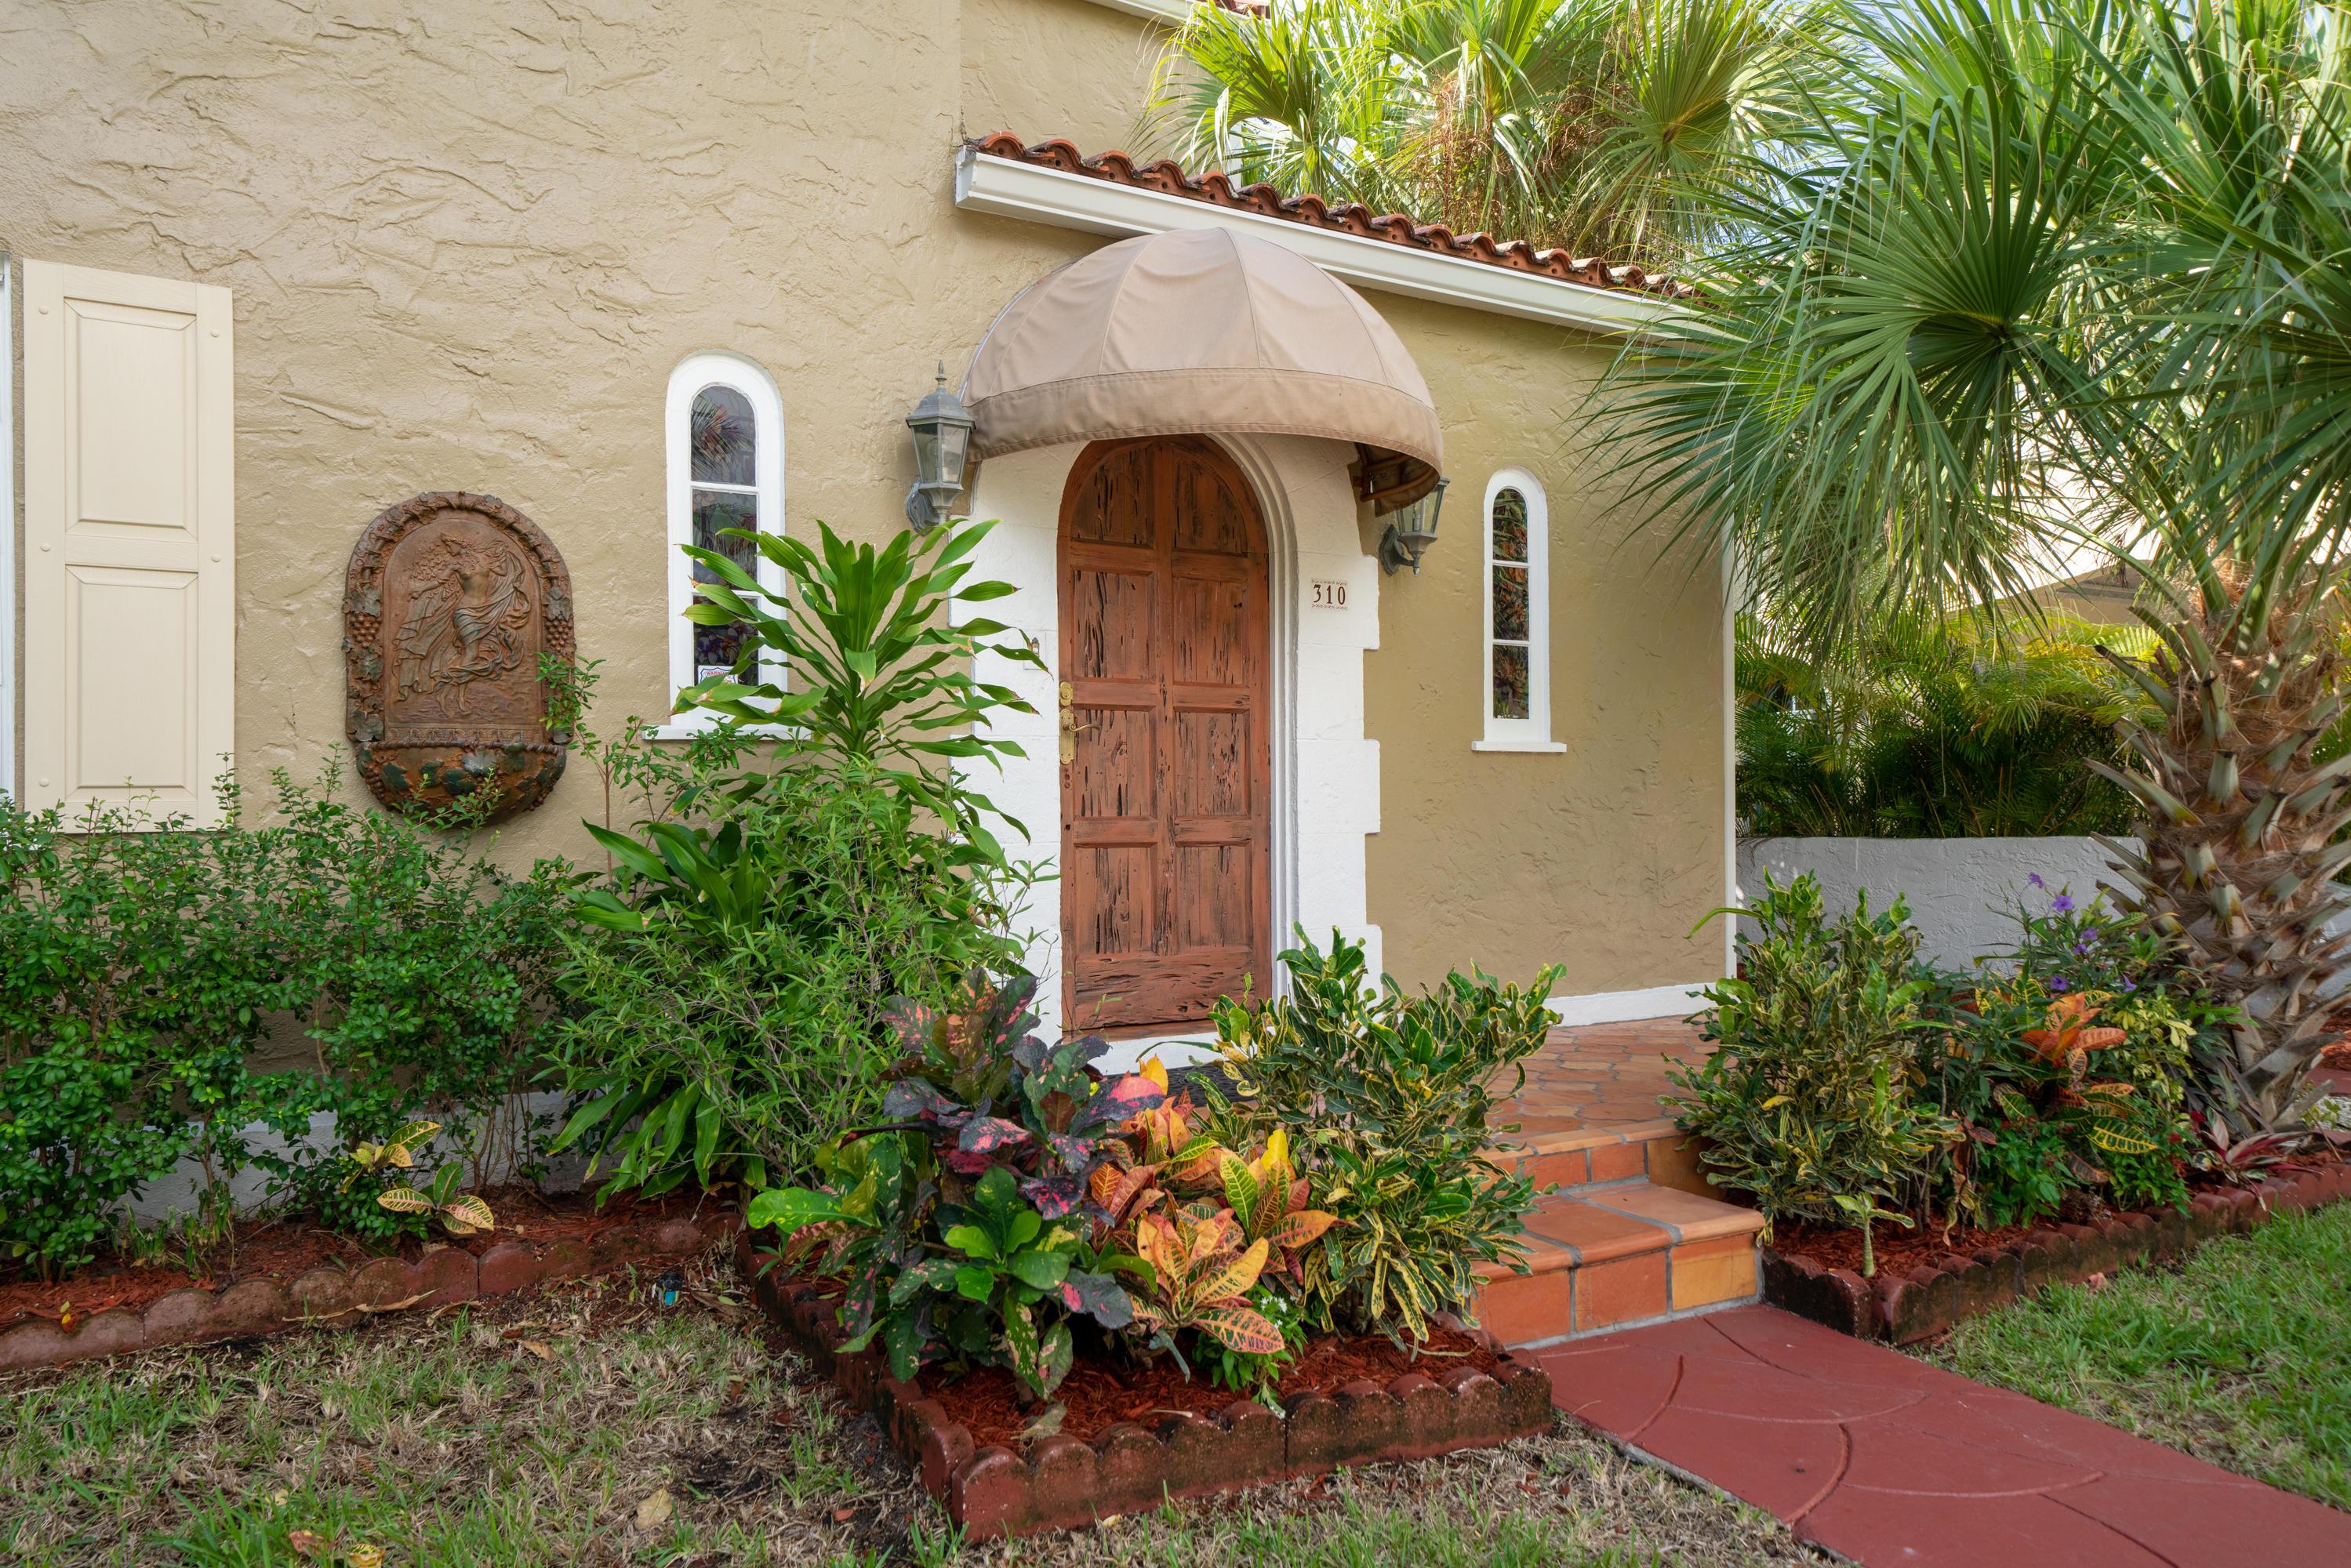 310 Granada Road, West Palm Beach, FL 33401